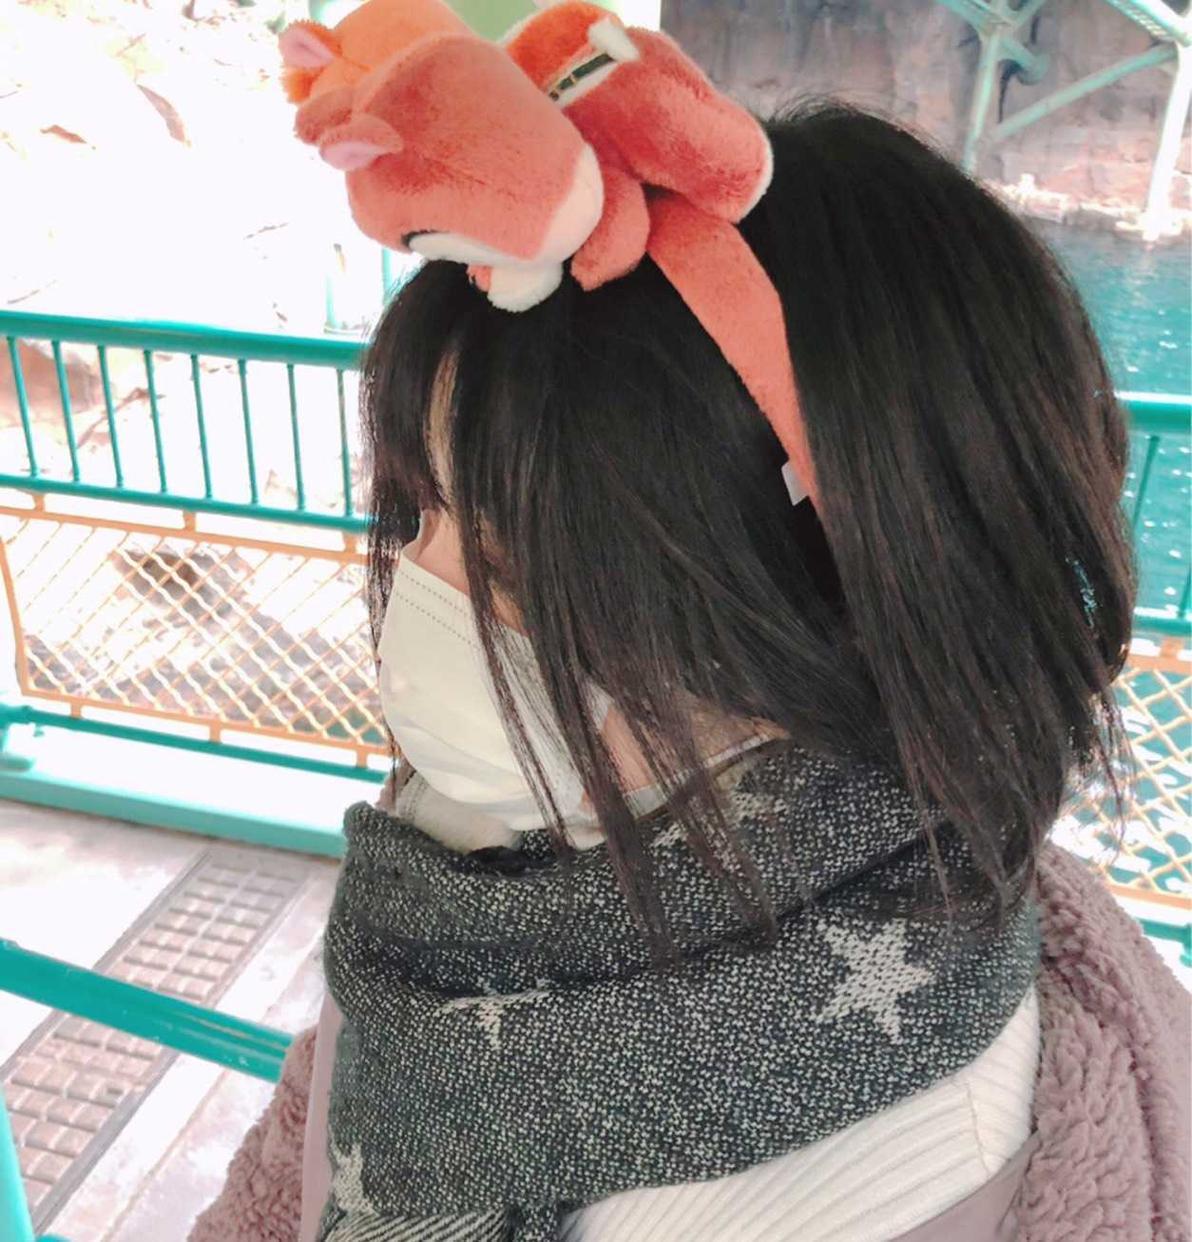 美容ライター / 日本化粧品検定2級 kyoko